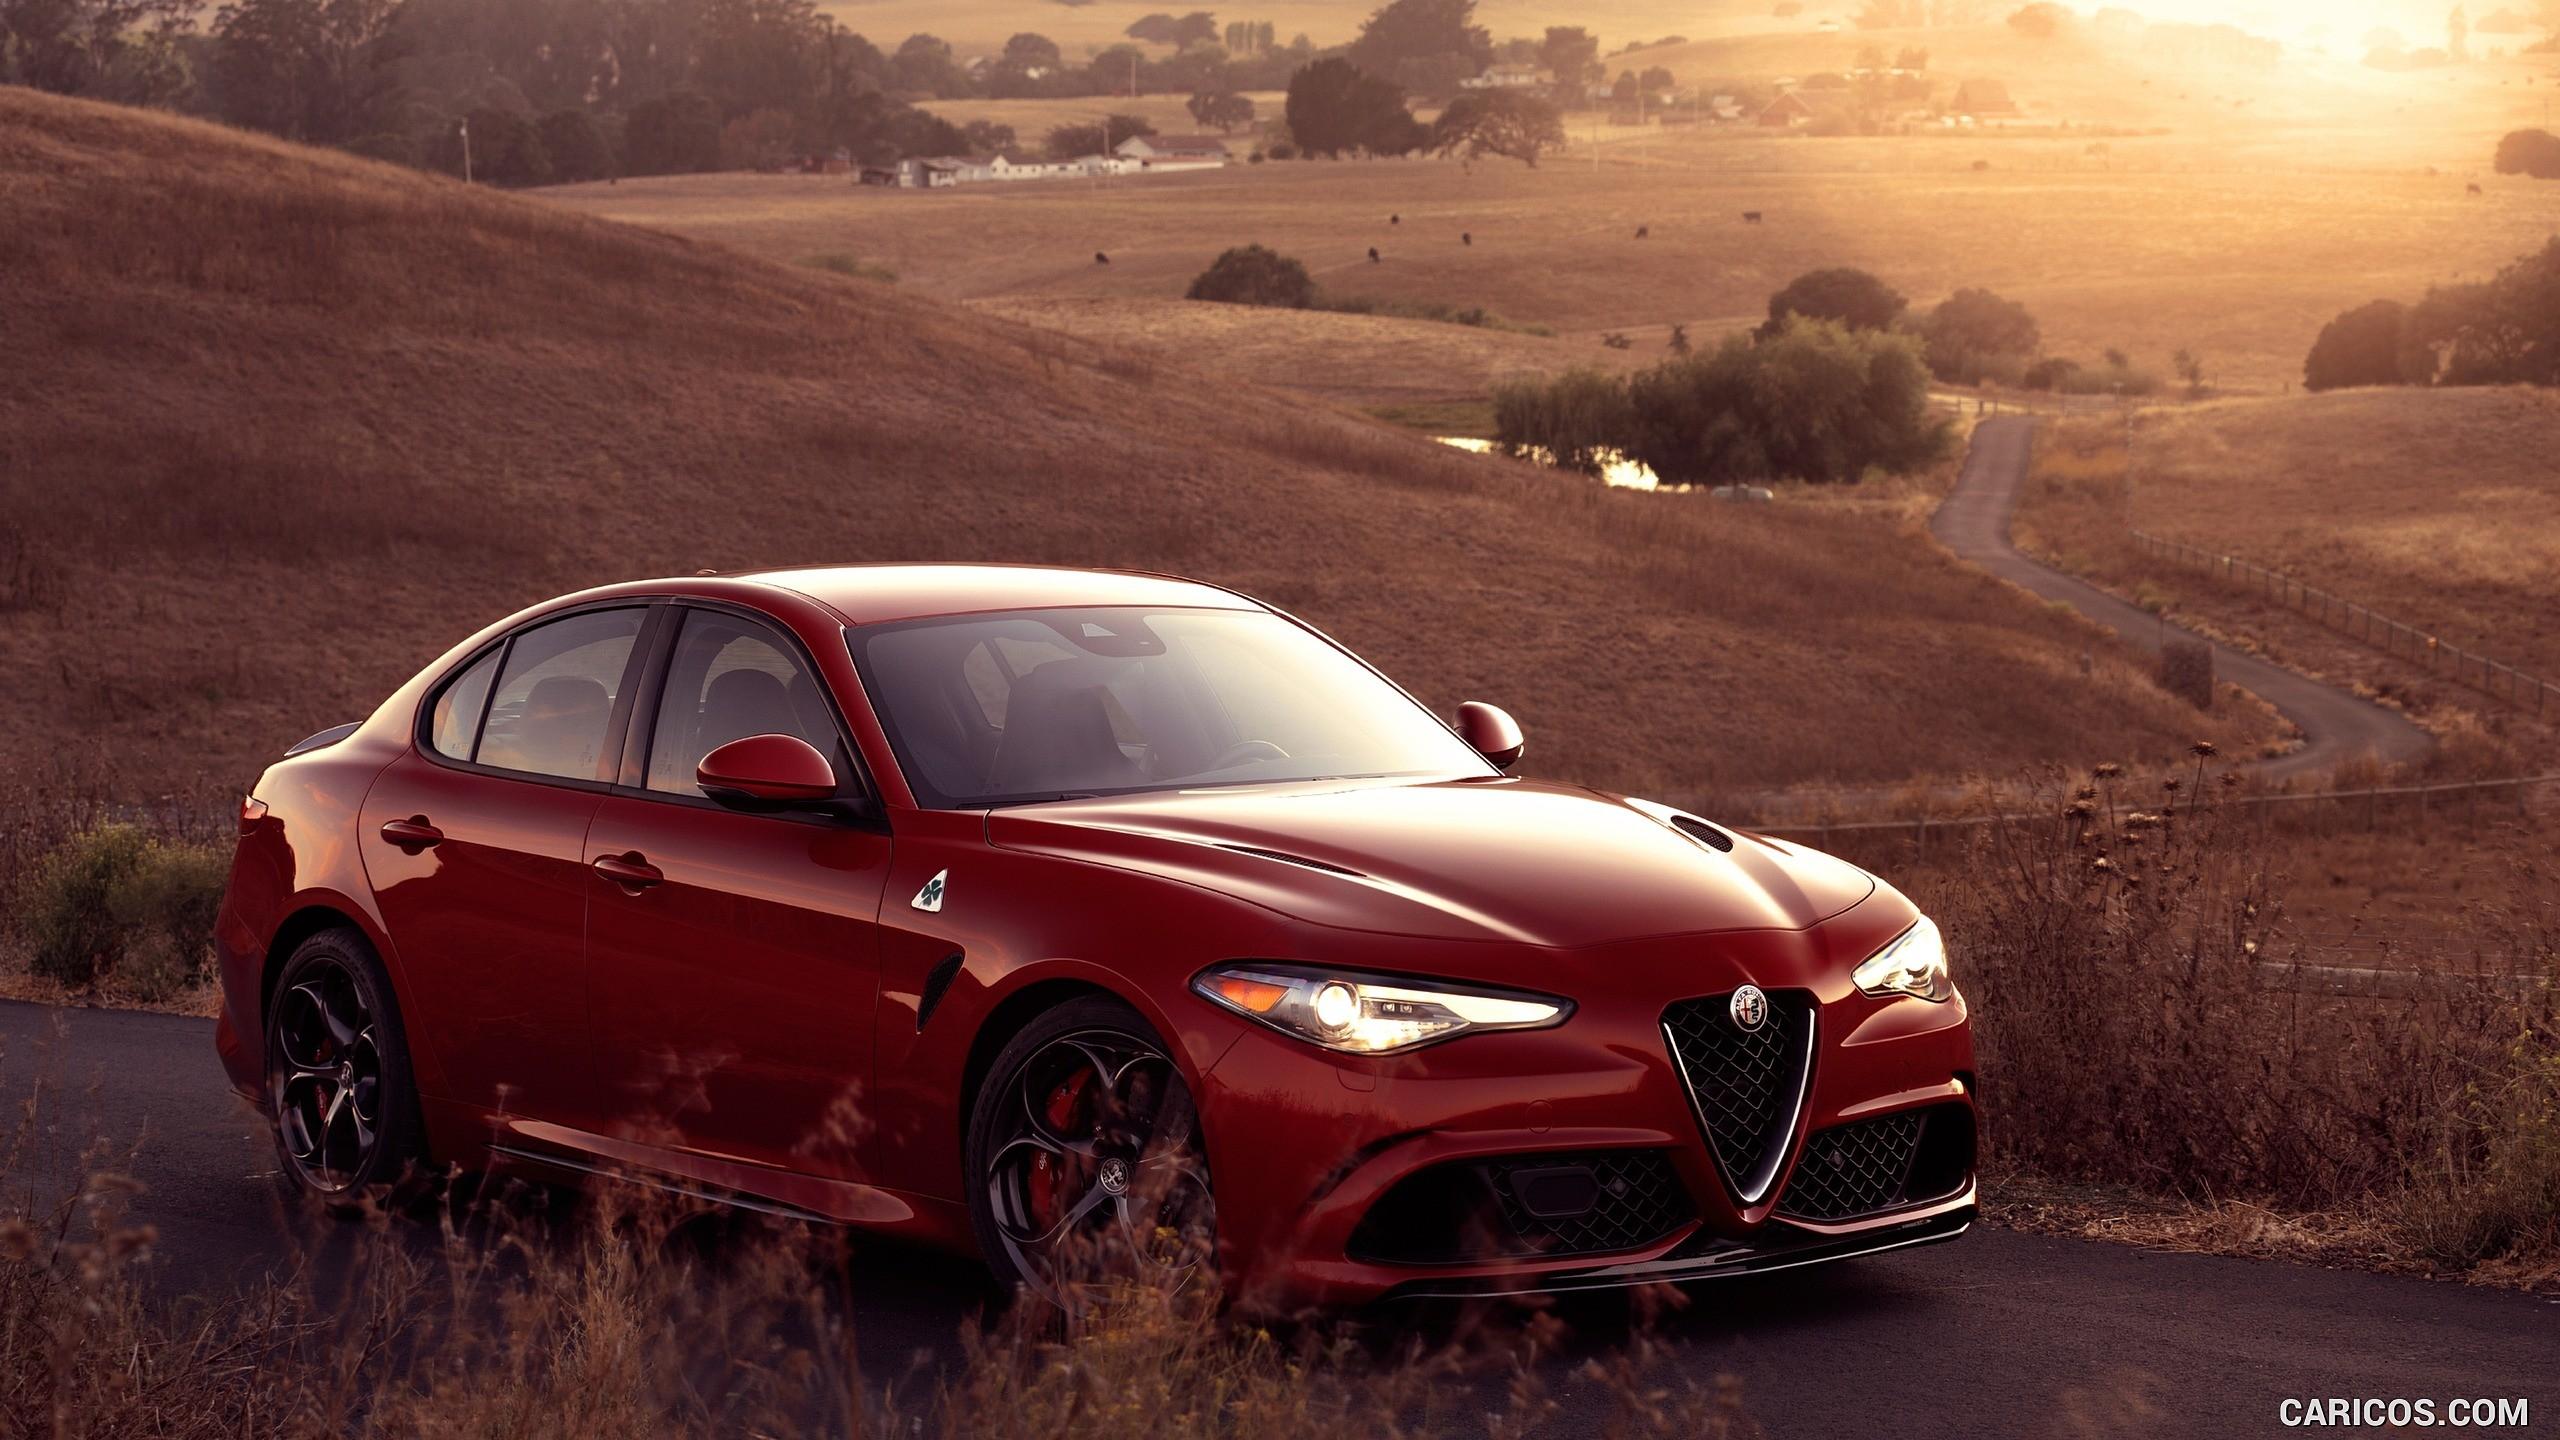 General 2560x1440 Alfa Romeo red cars italian cars Italy